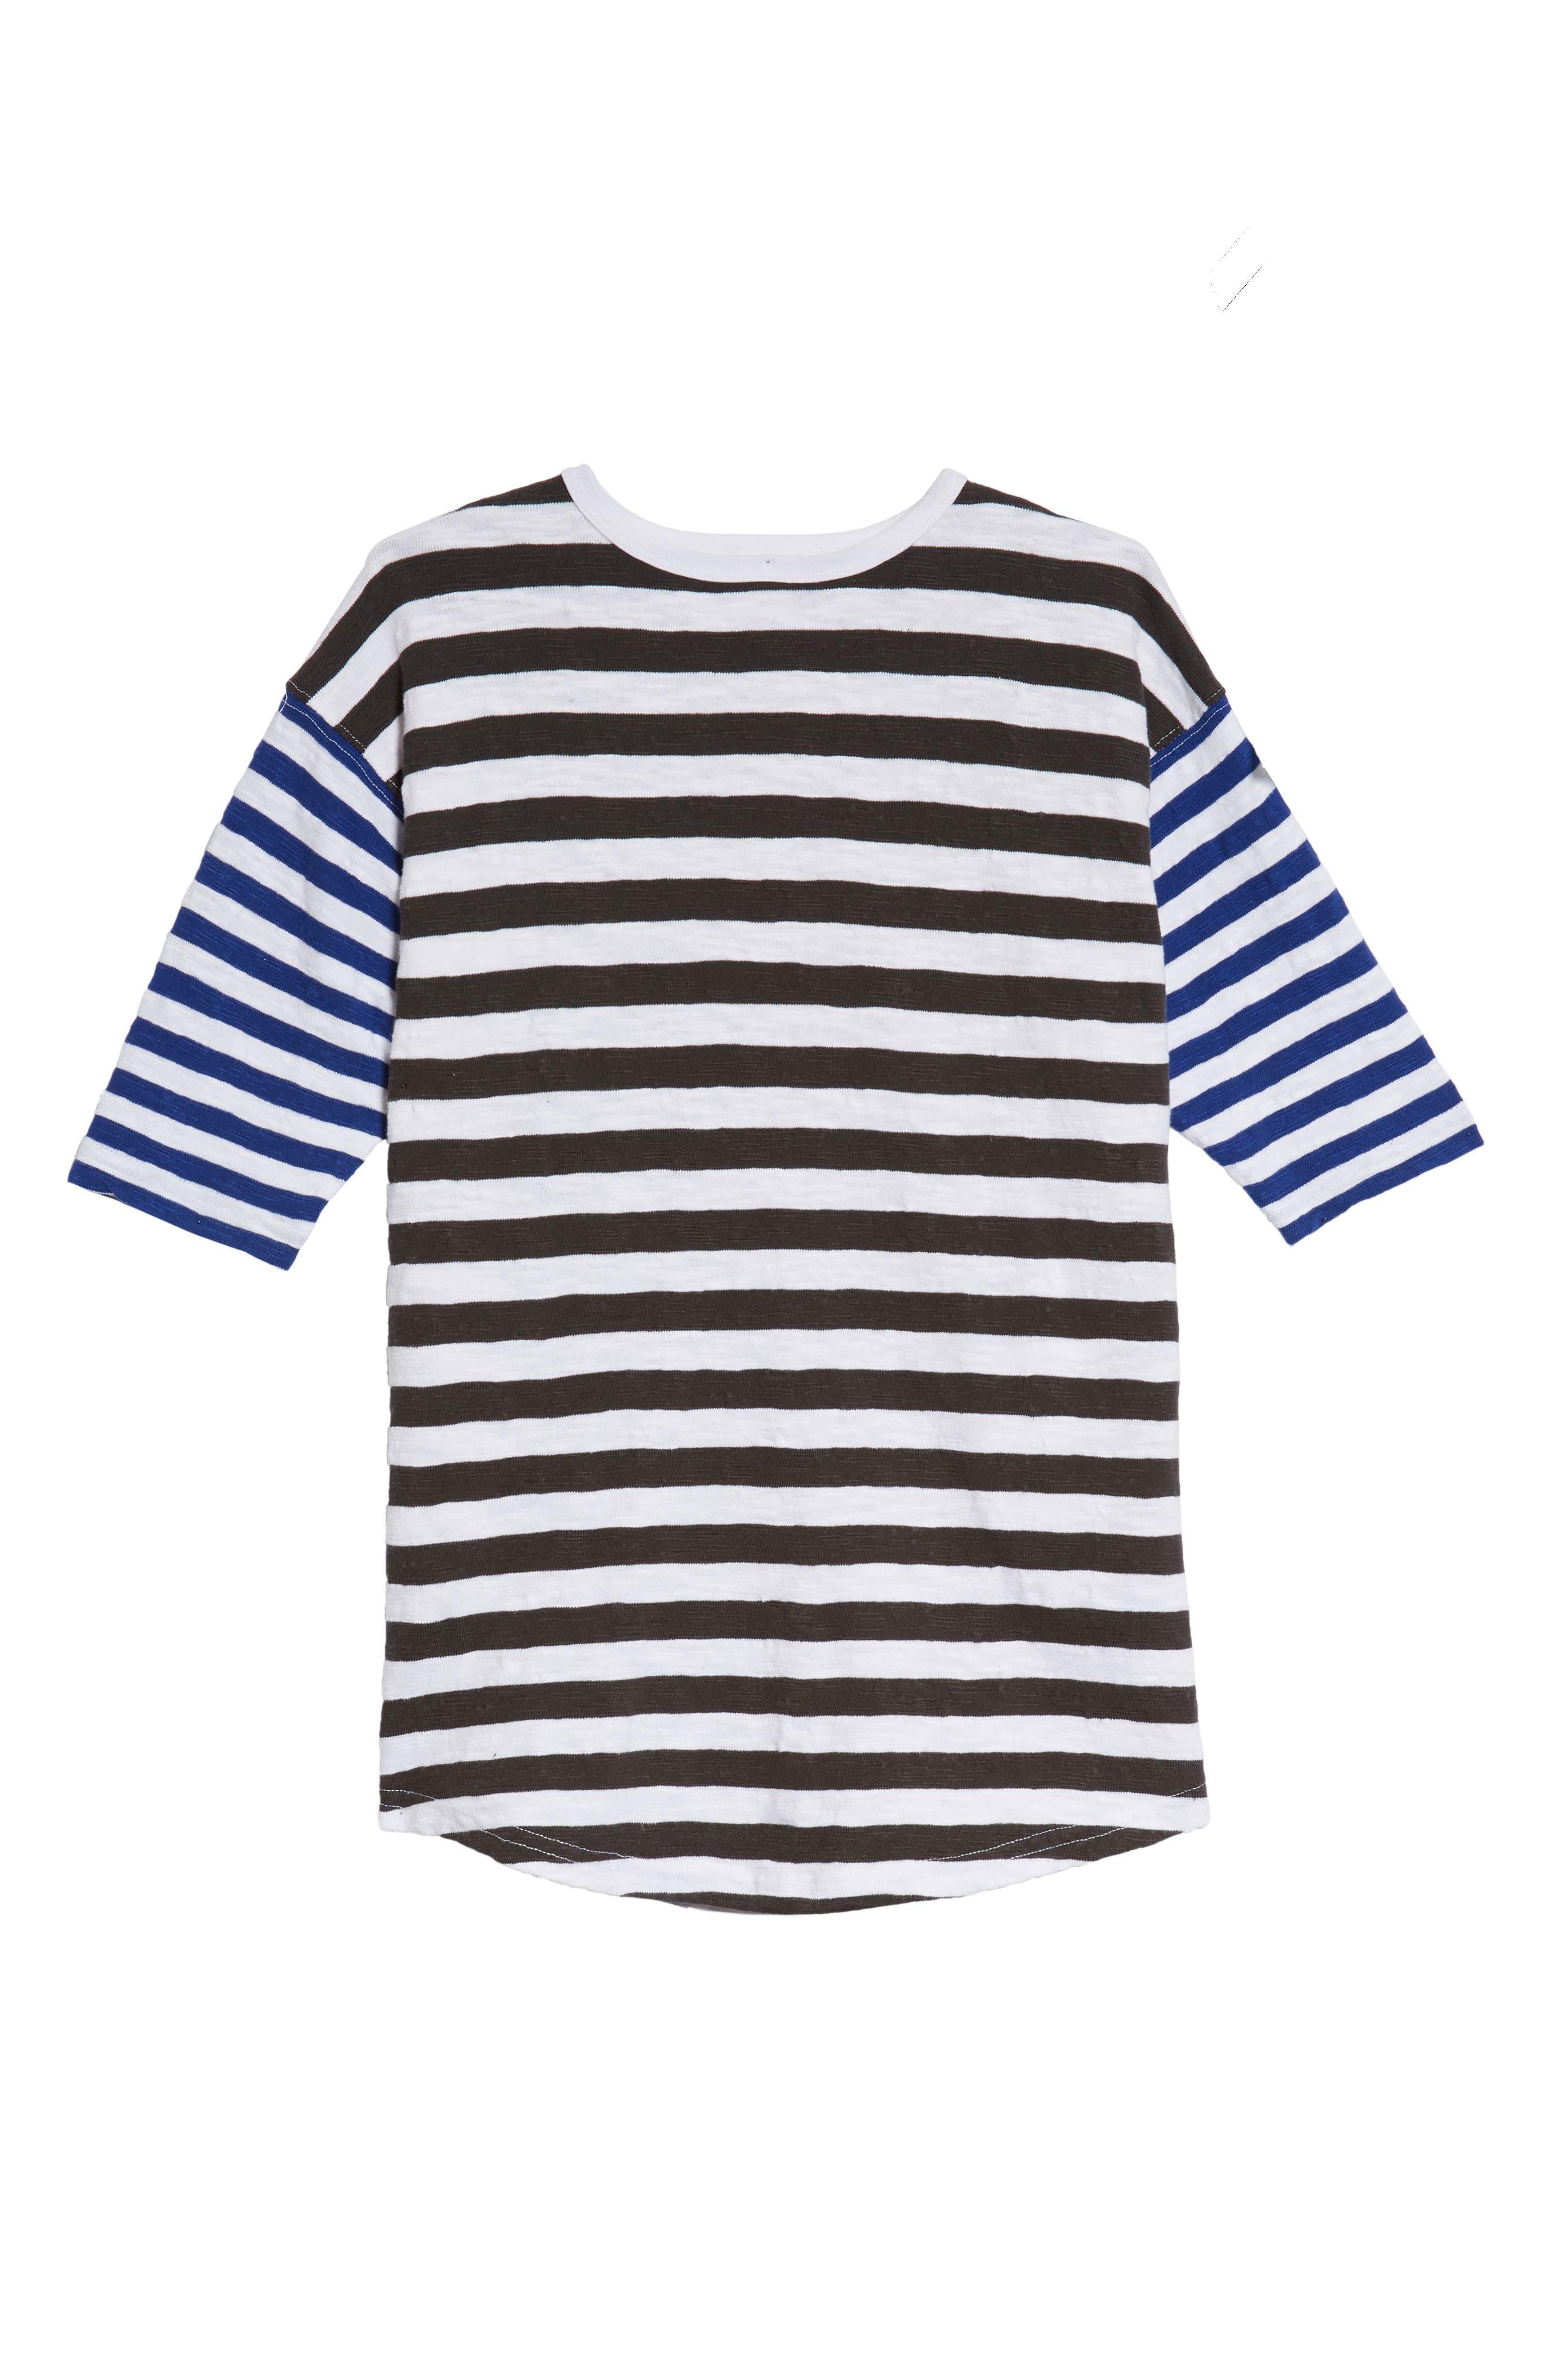 Mixed Stripe Dress,                             Main thumbnail 1, color,